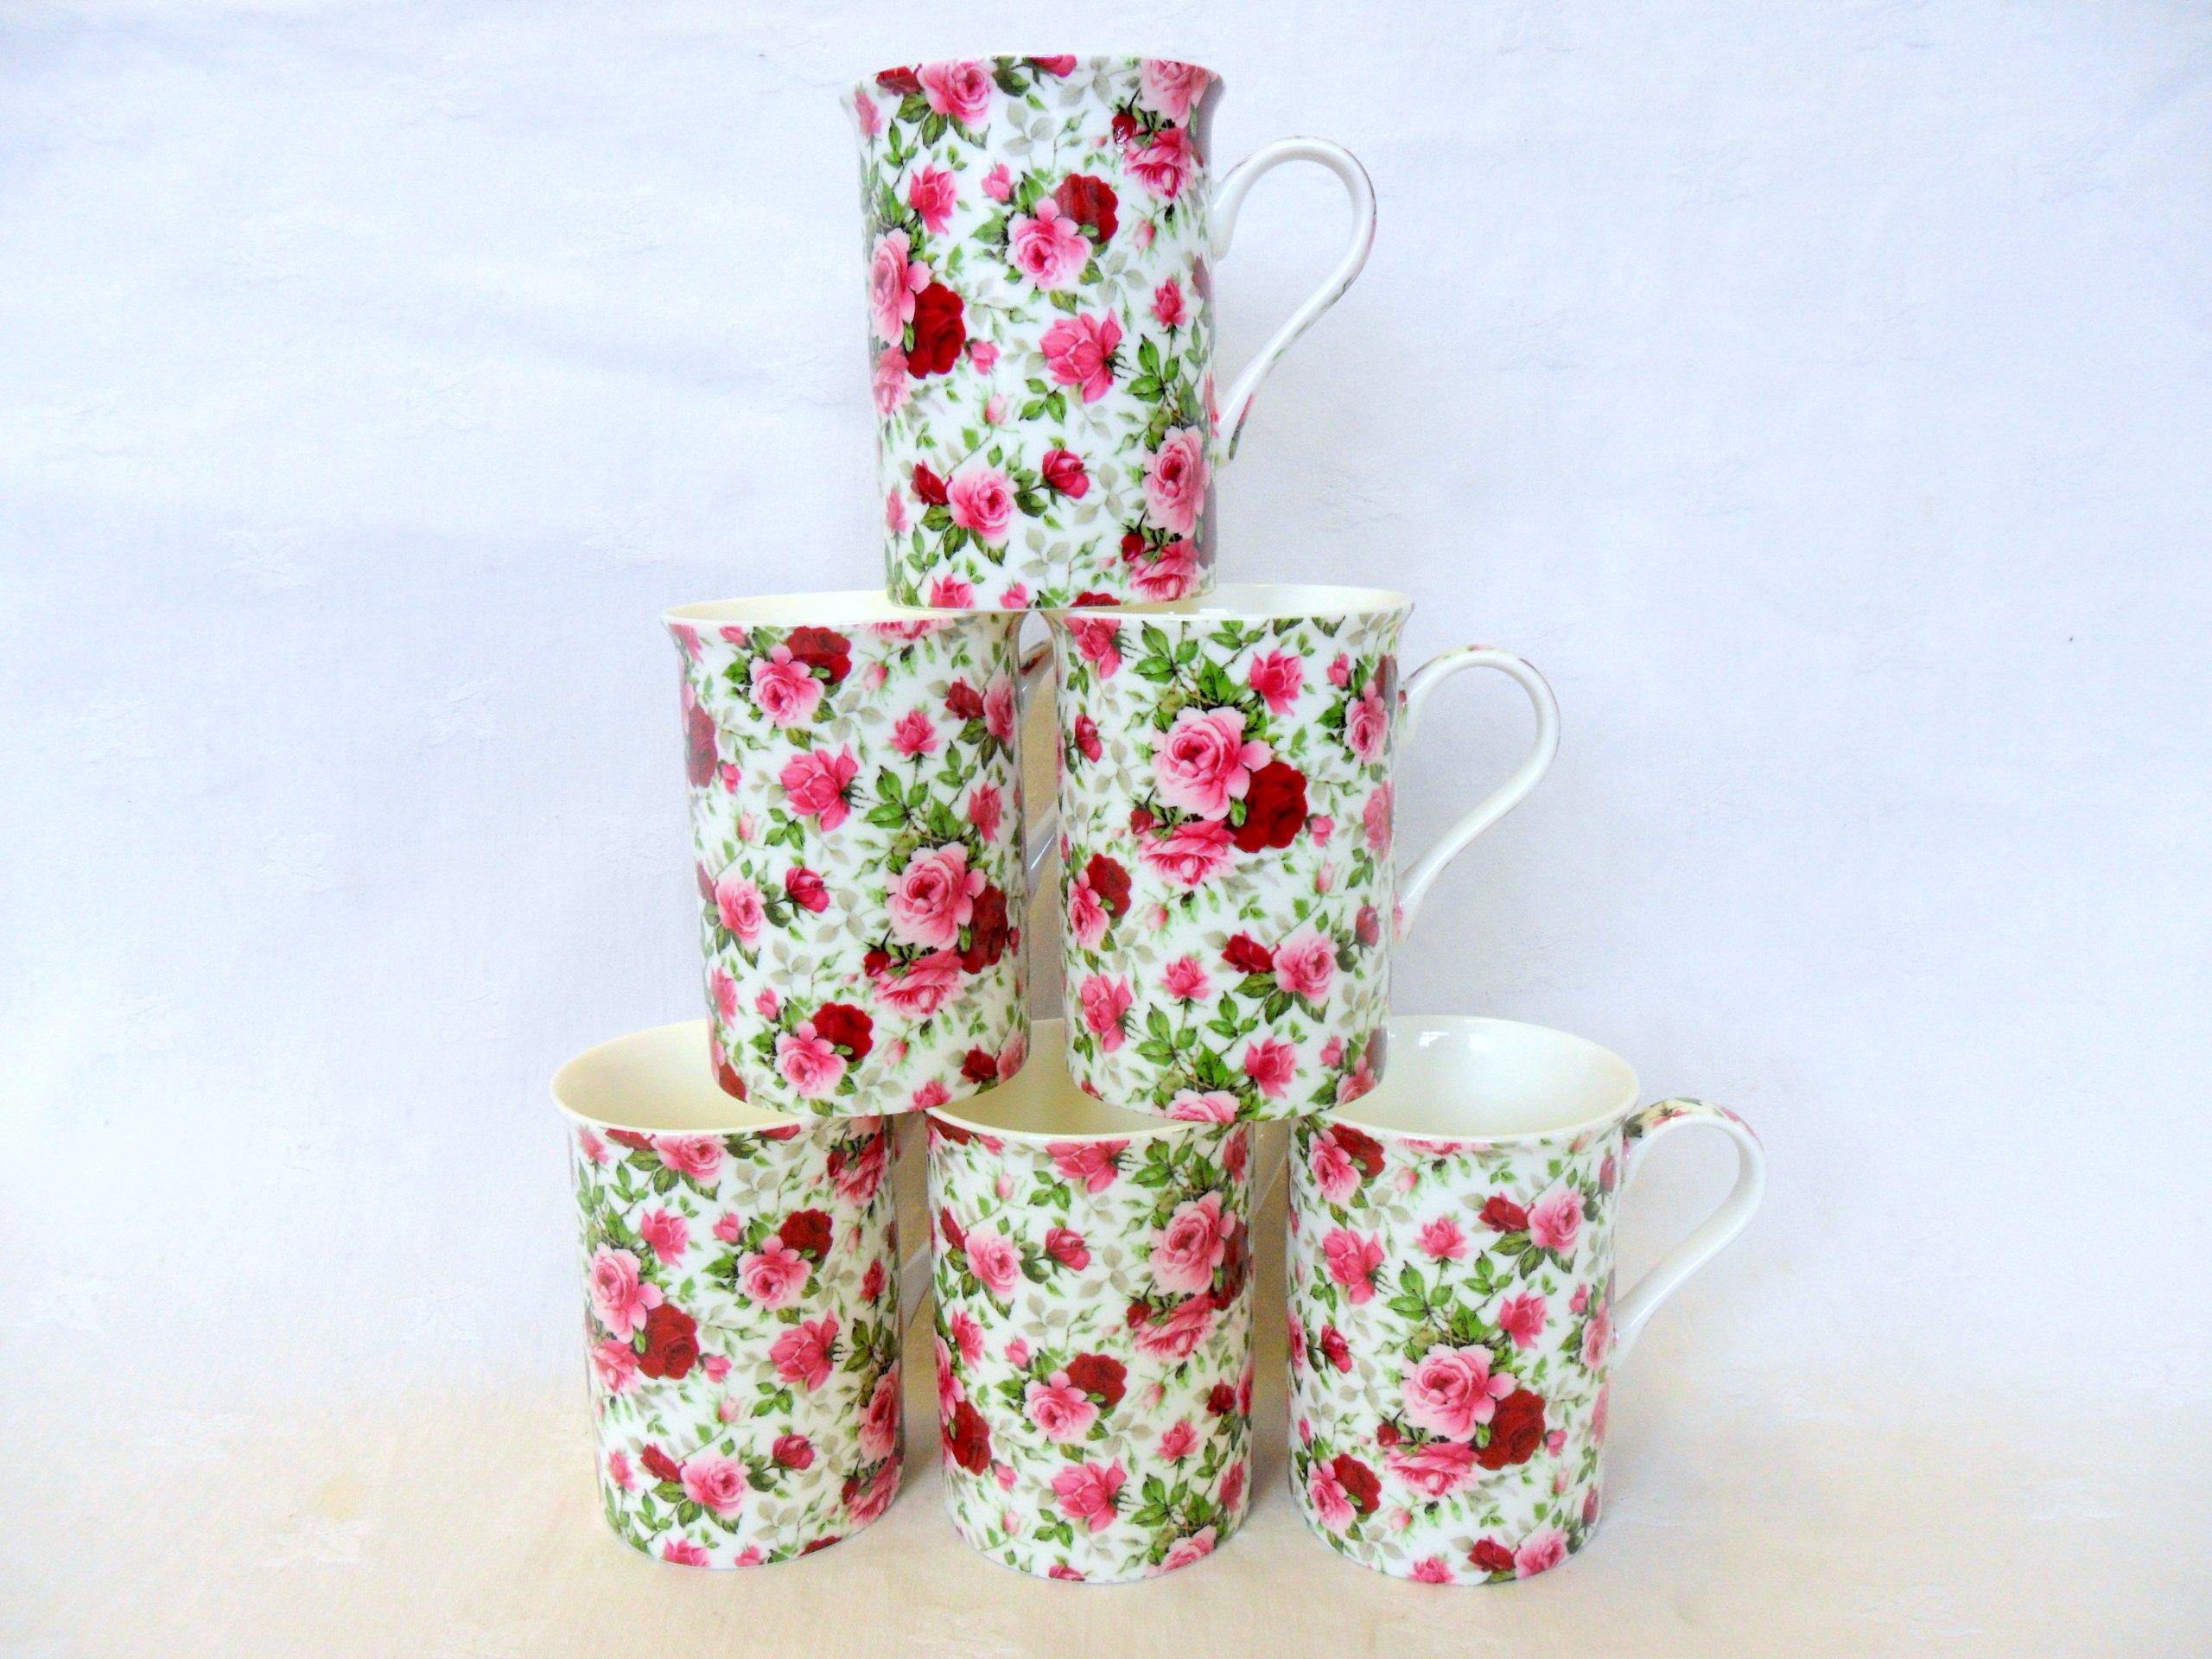 Set of 6 China 10oz Mugs in Summertime Design